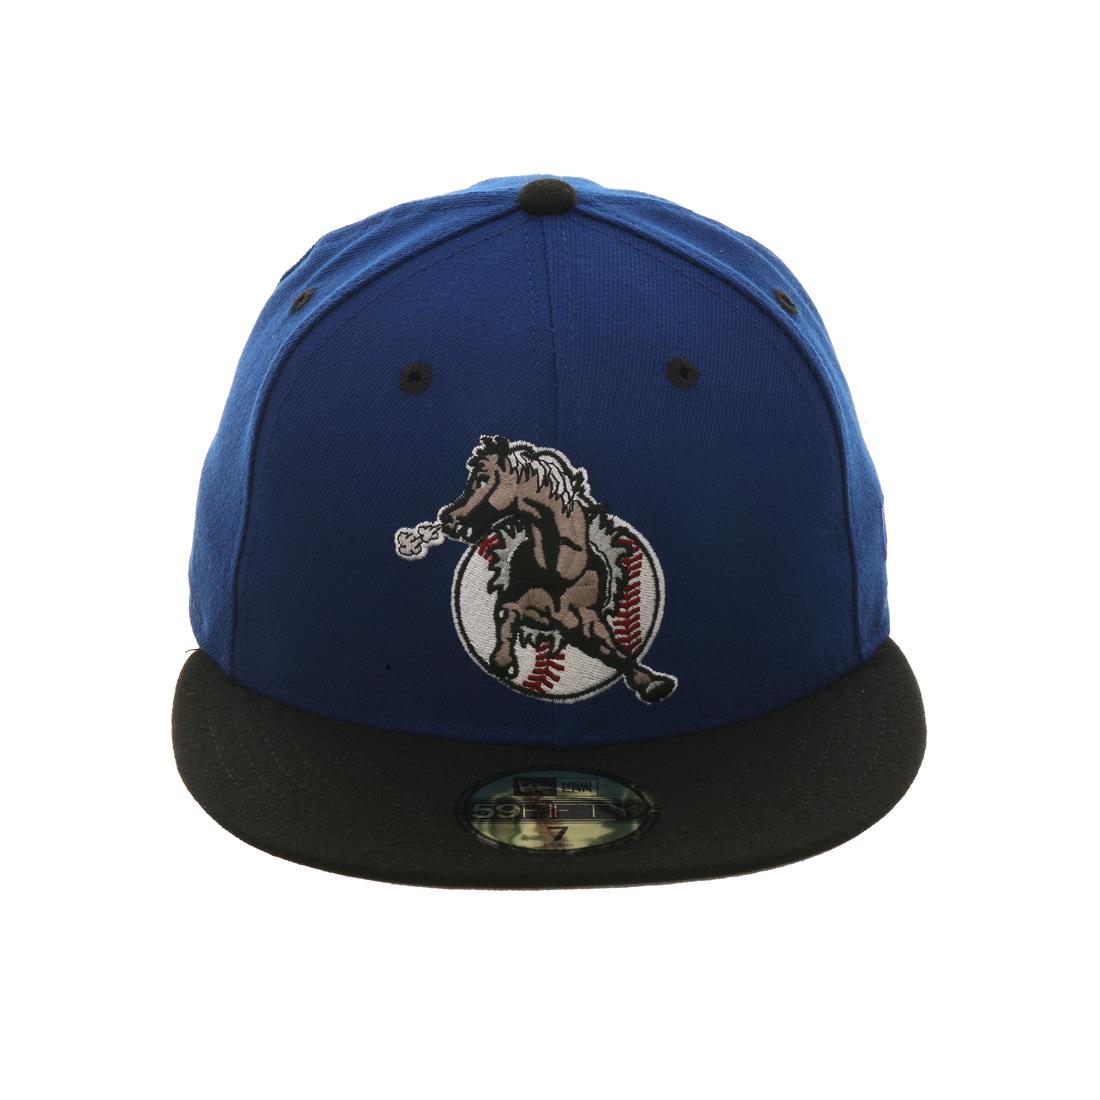 0b43a84f0a0 Exclusive New Era 59Fifty San Bernardino Stampede Hat